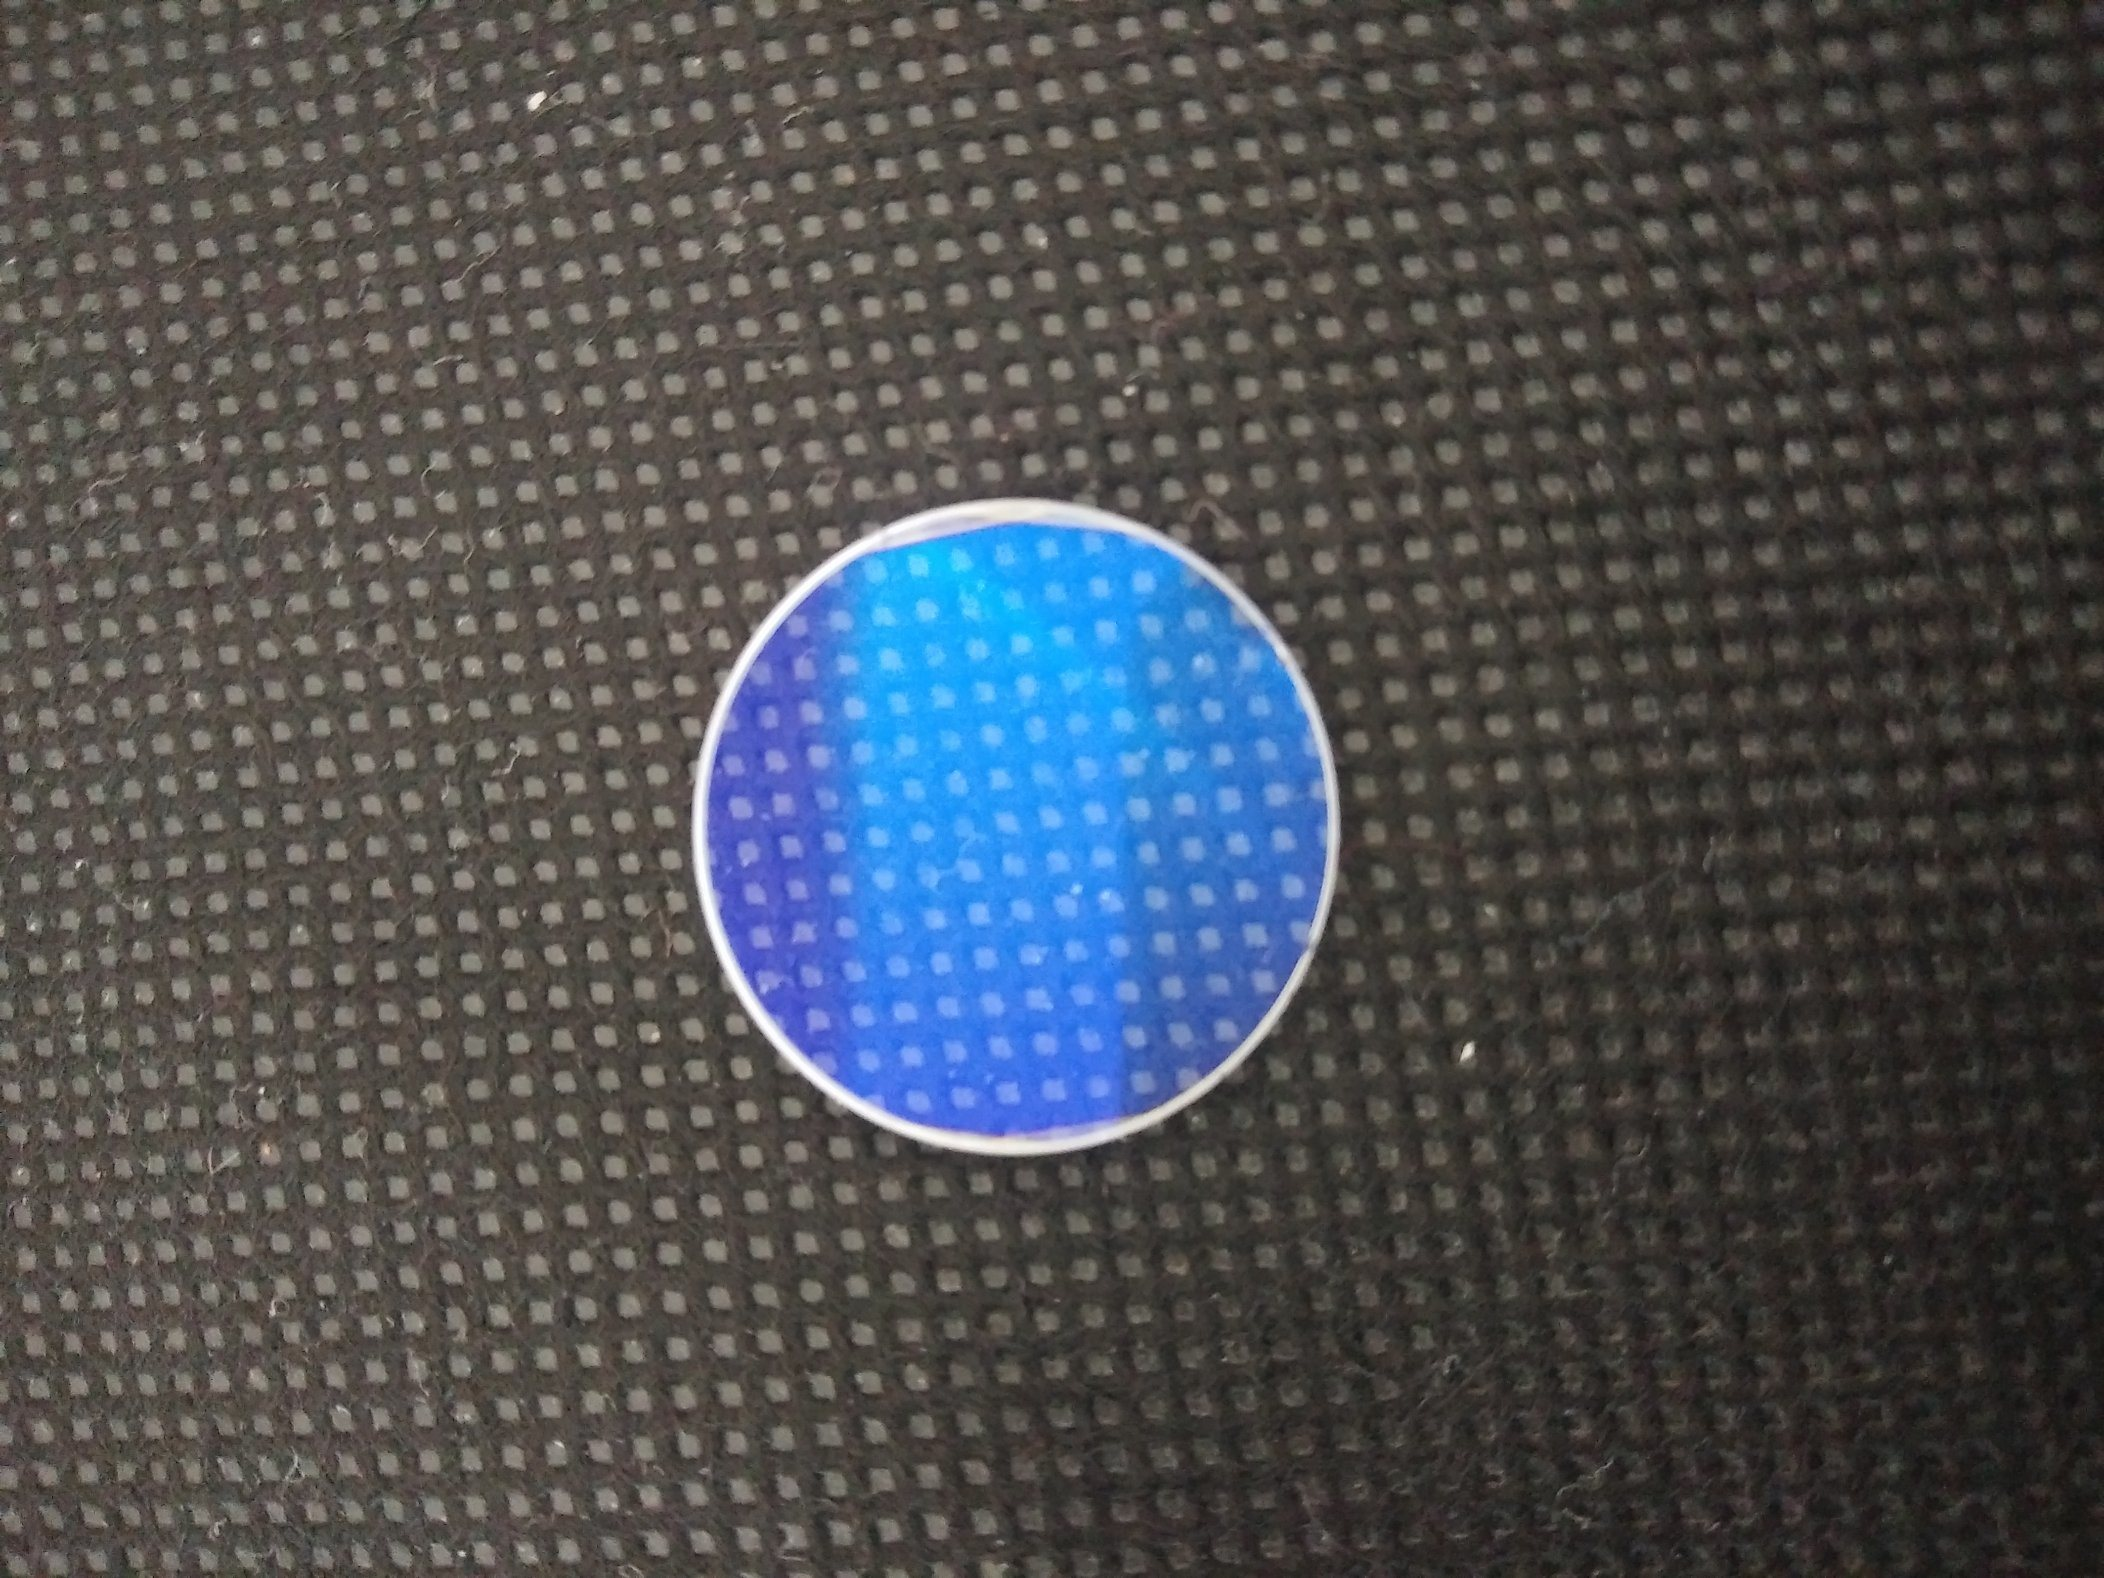 Sapphire Window/Sapphire Glass/Optical Sapphire Window